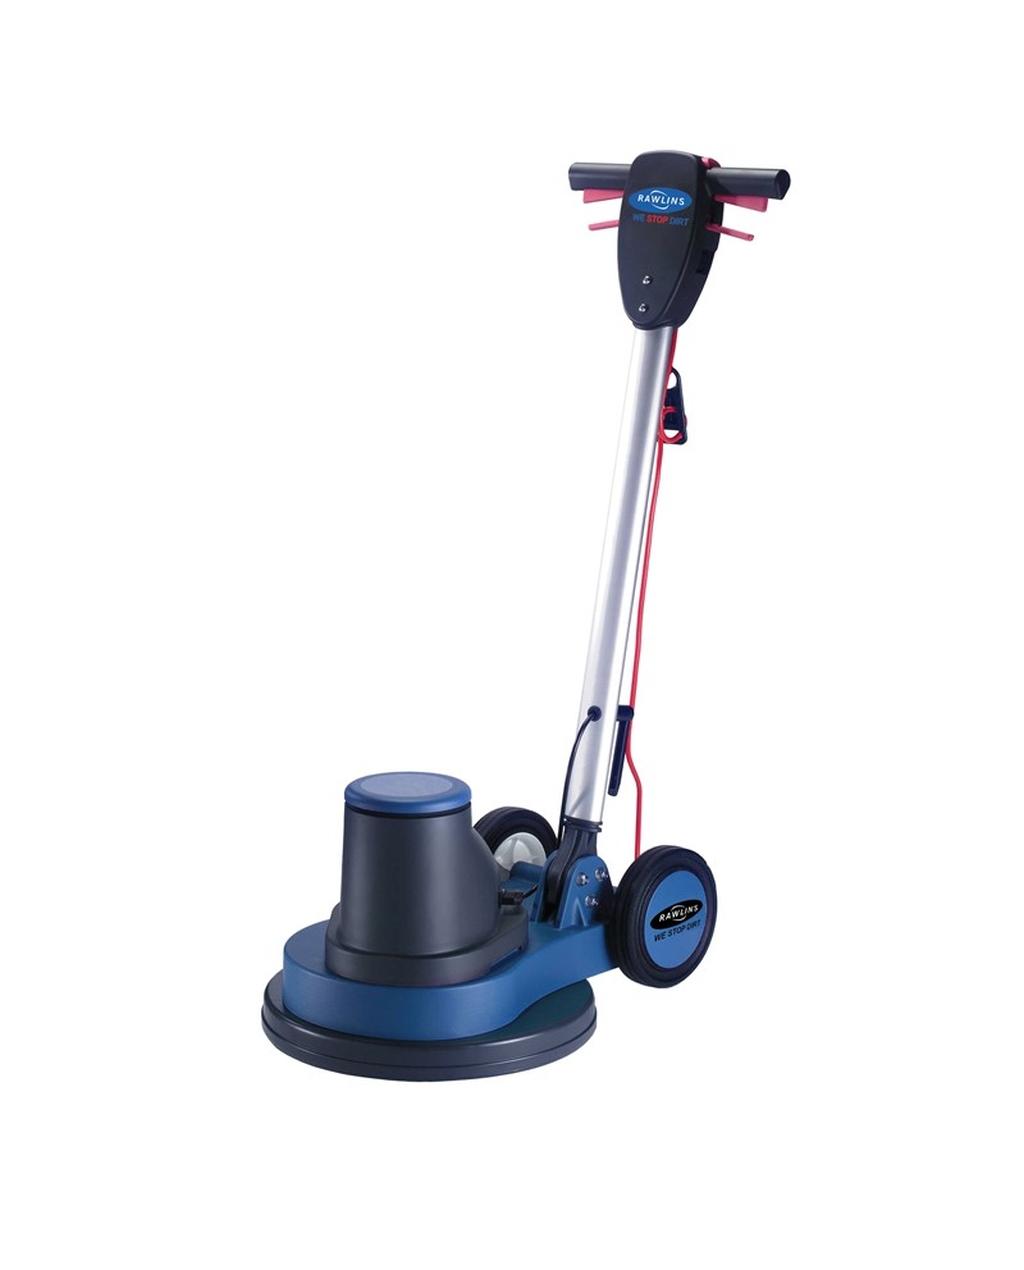 400rpm High Speed Floor Polisher (17 inch)